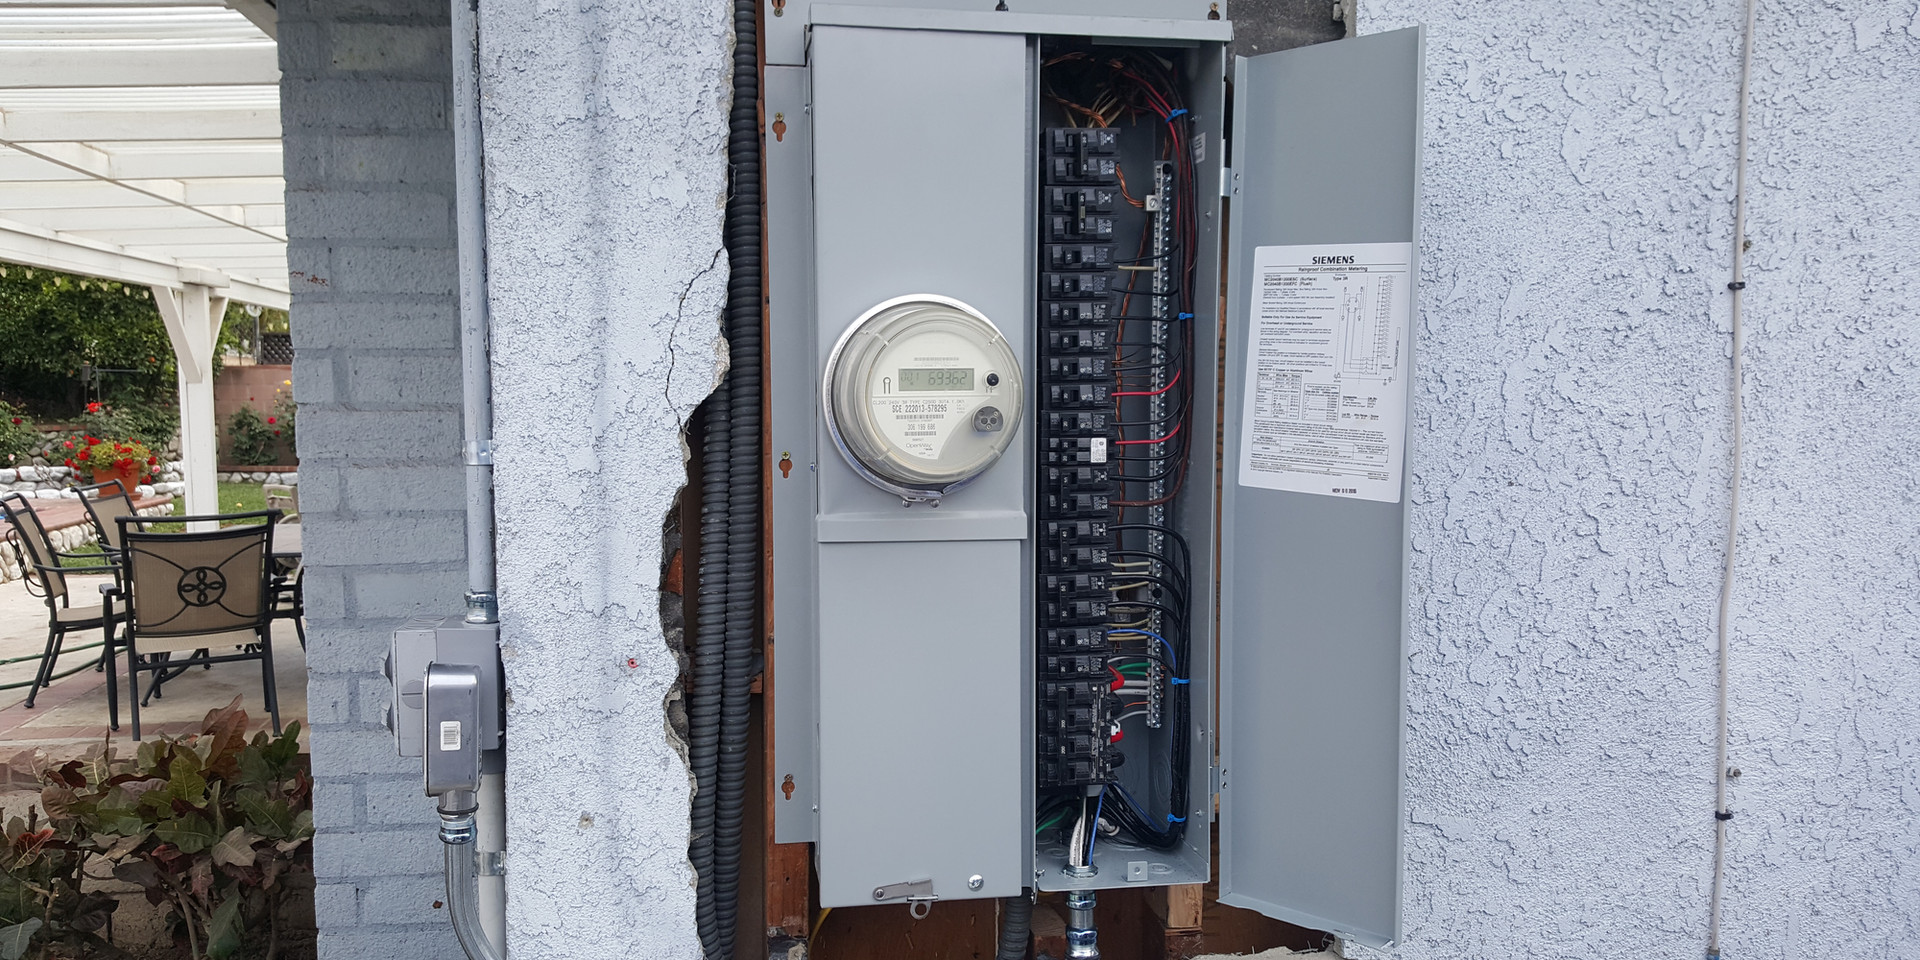 Breaker aka Service Panel Installation in Progress